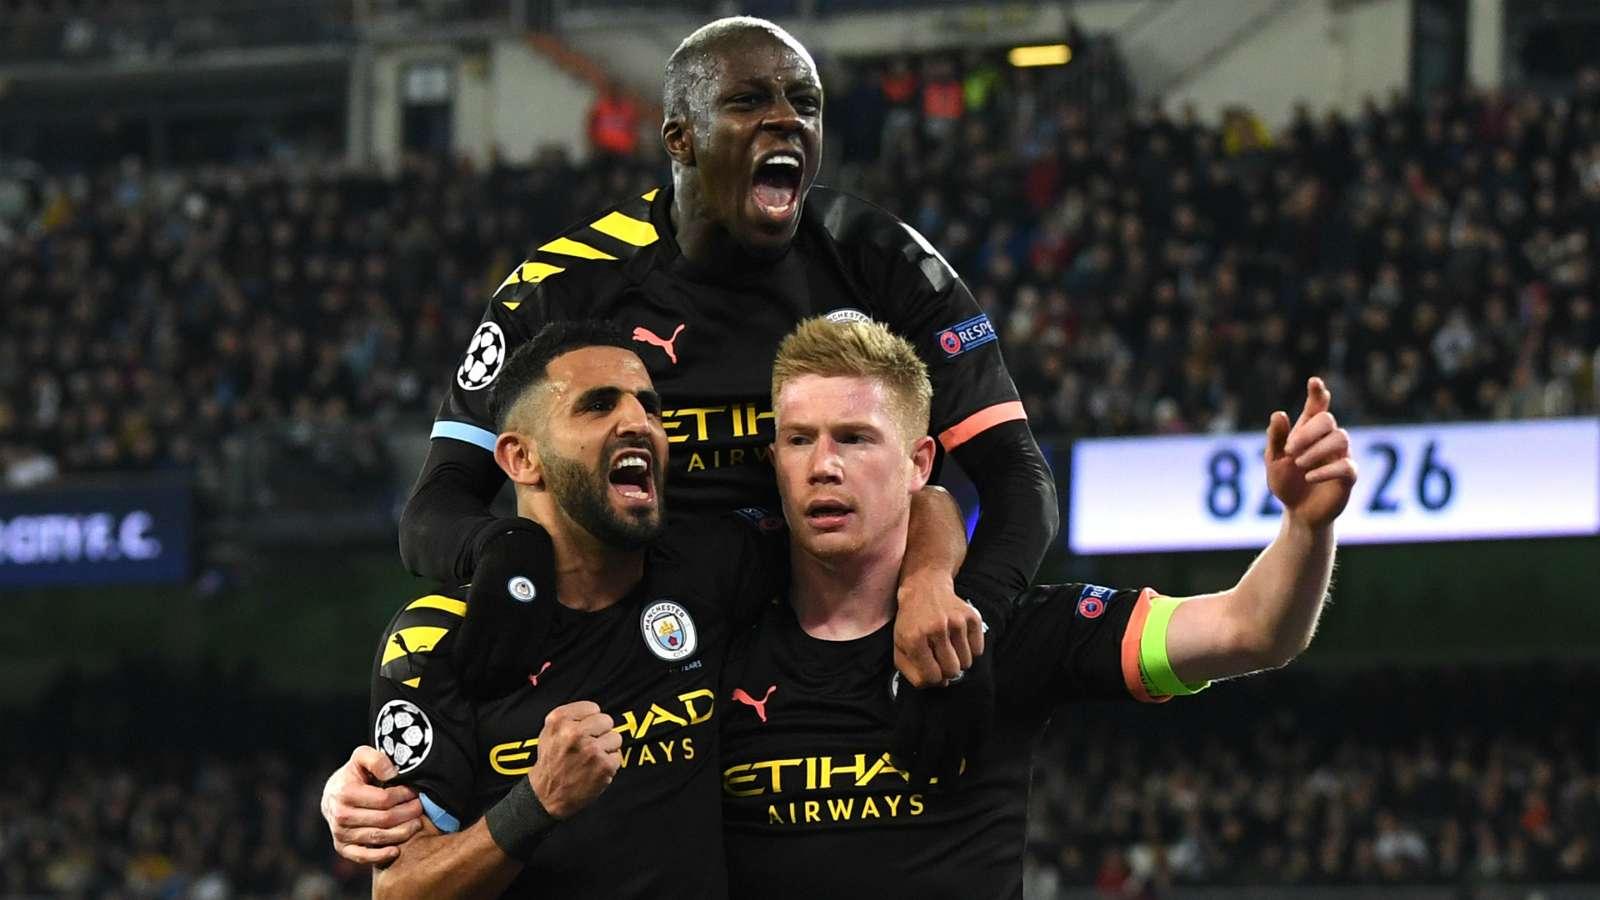 Manchester City celebrate 2019-20